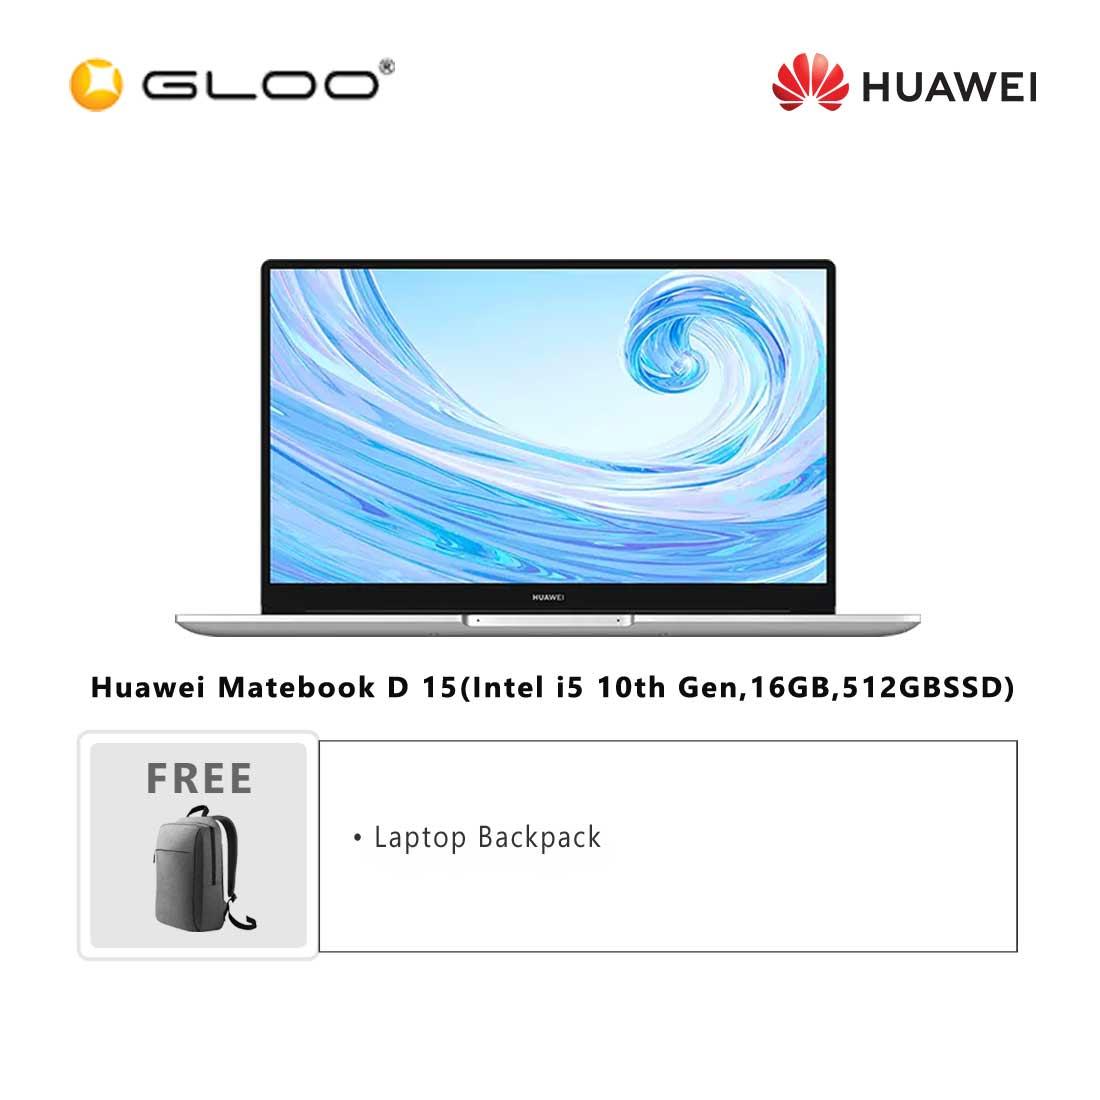 Huawei Matebook D 15(Intel i5 10th Gen,16GB,512GBSSD)-53012BYF + FREE Huawei CD60 Matebook Series Laptop Backpack Grey [BPPHUAWBYFNBAG]